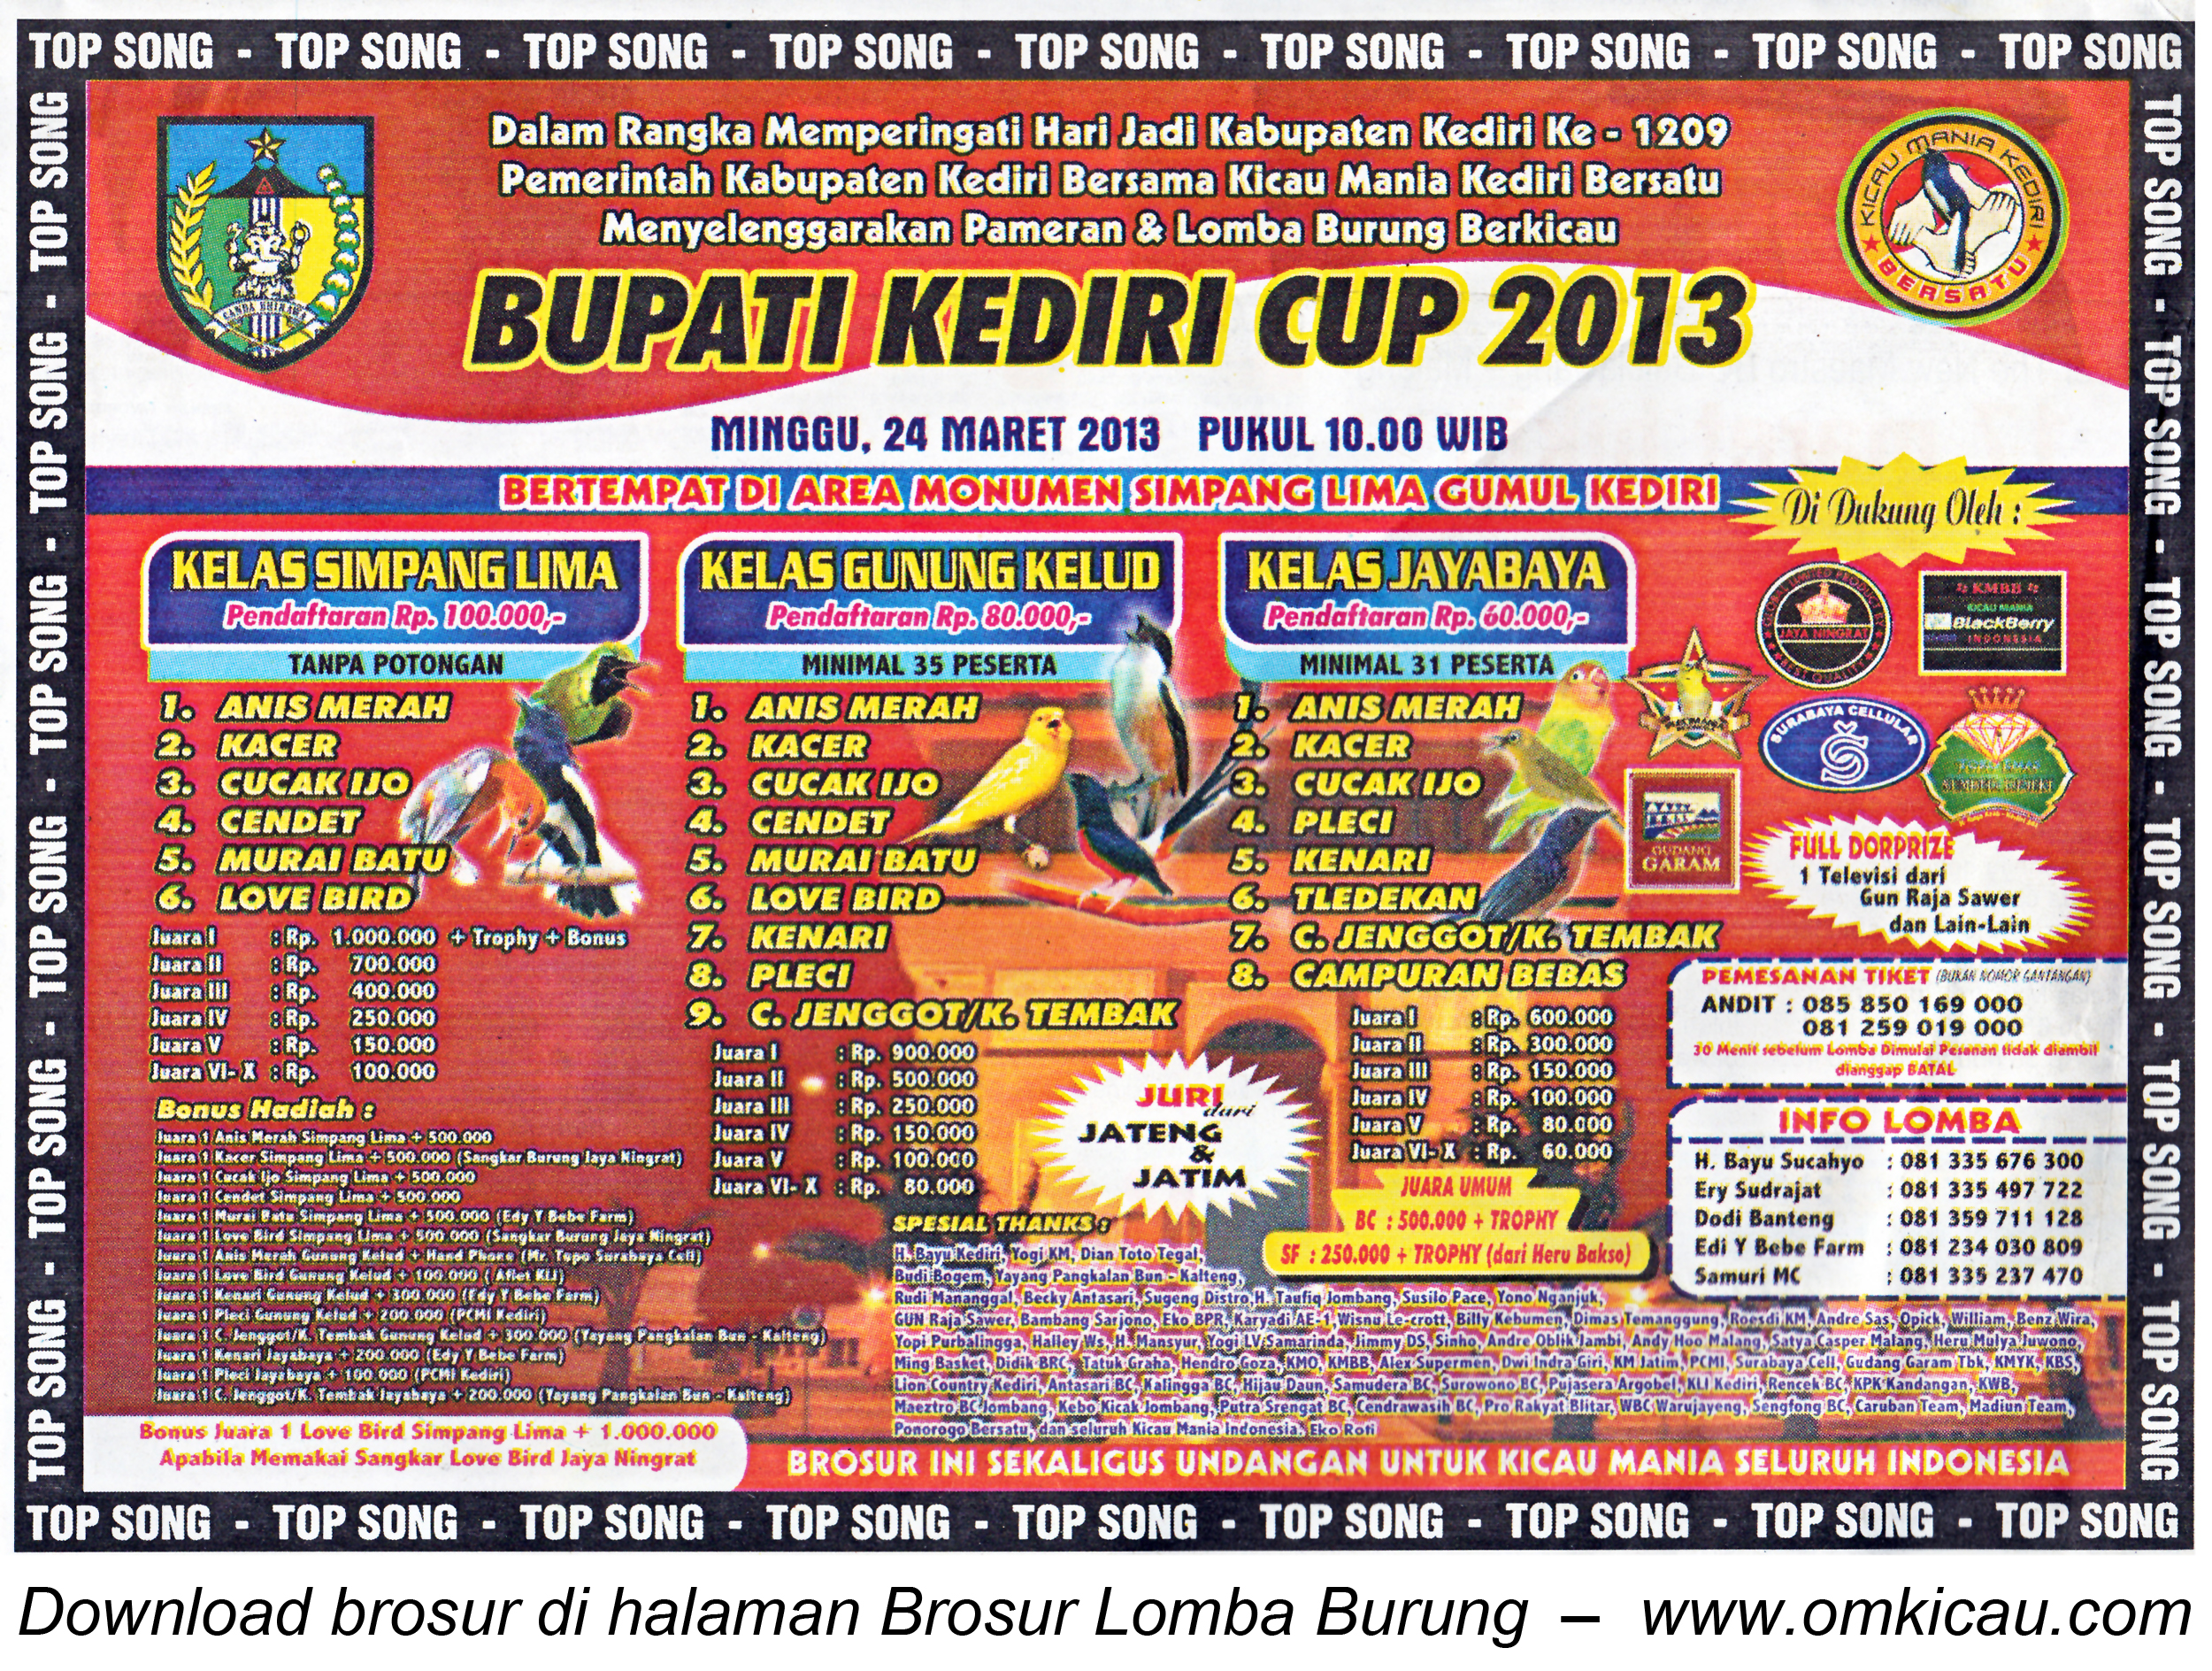 Brosur Lomba Bupati Kediri Cup